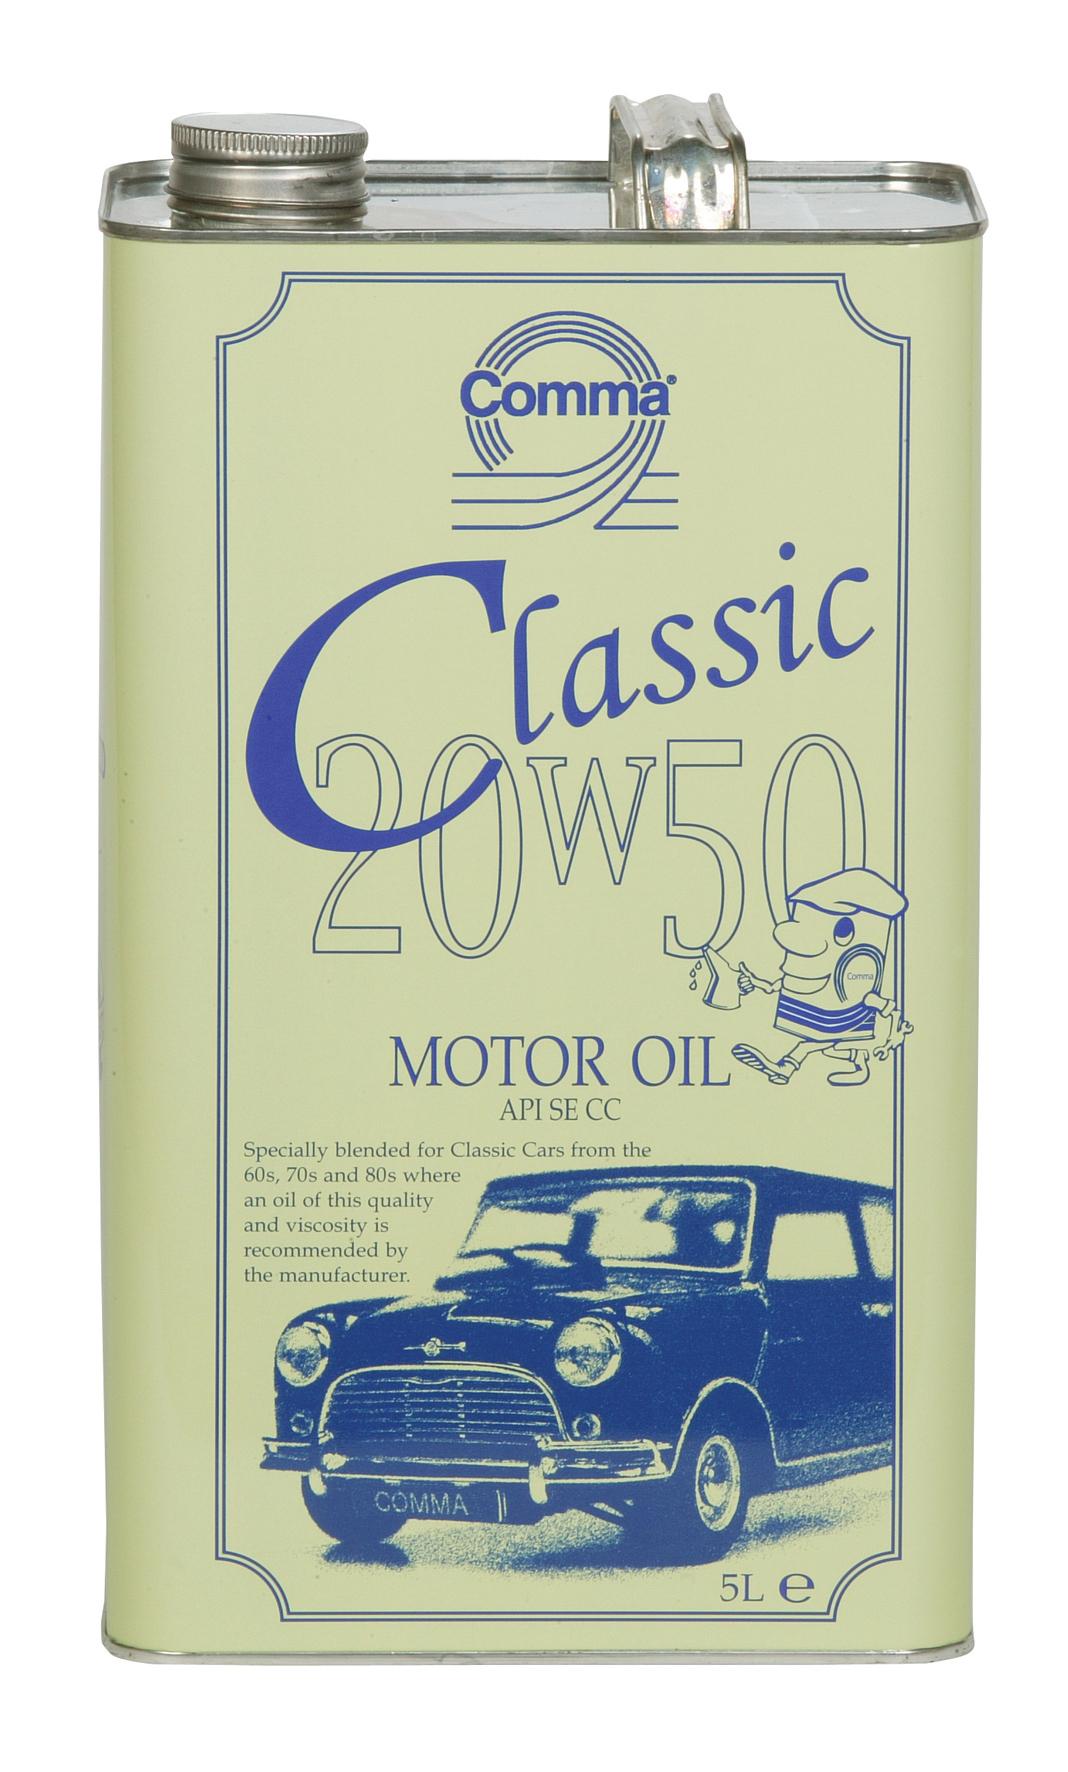 ULEI MOTOR COMMA CLASSIC MOTOR OIL 20W50 5L